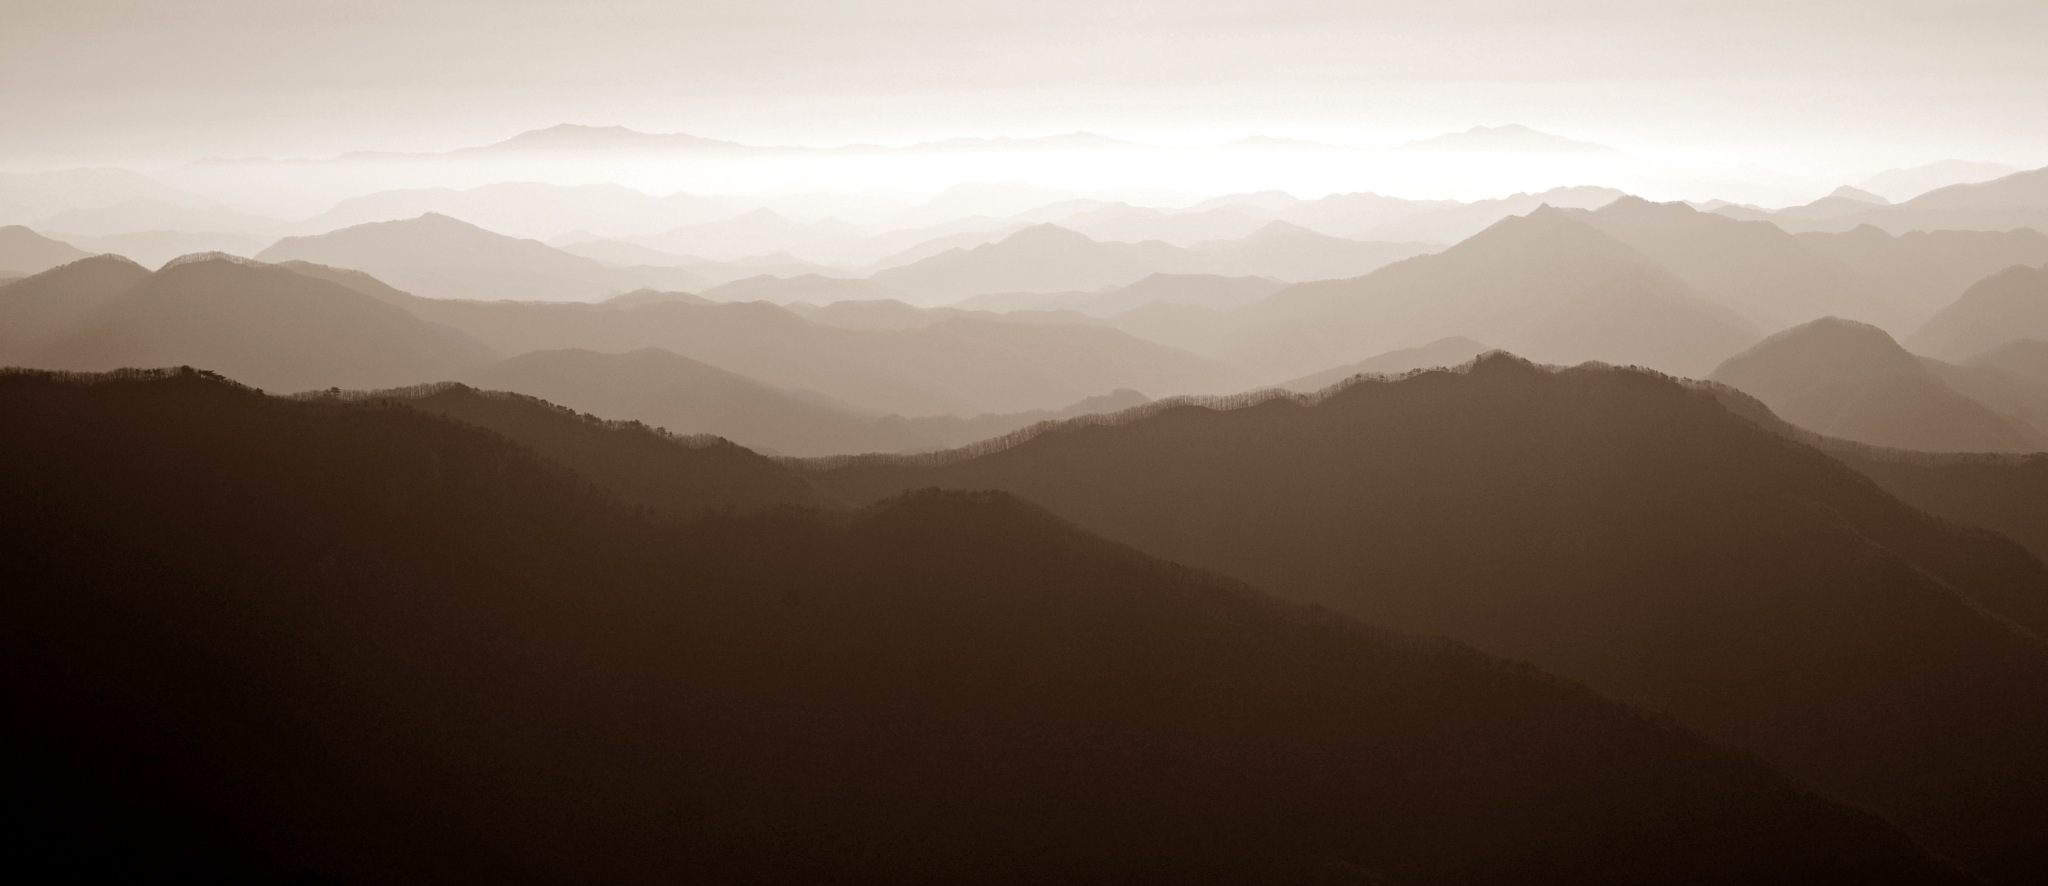 mountain layer by Bae Myung-Gyu